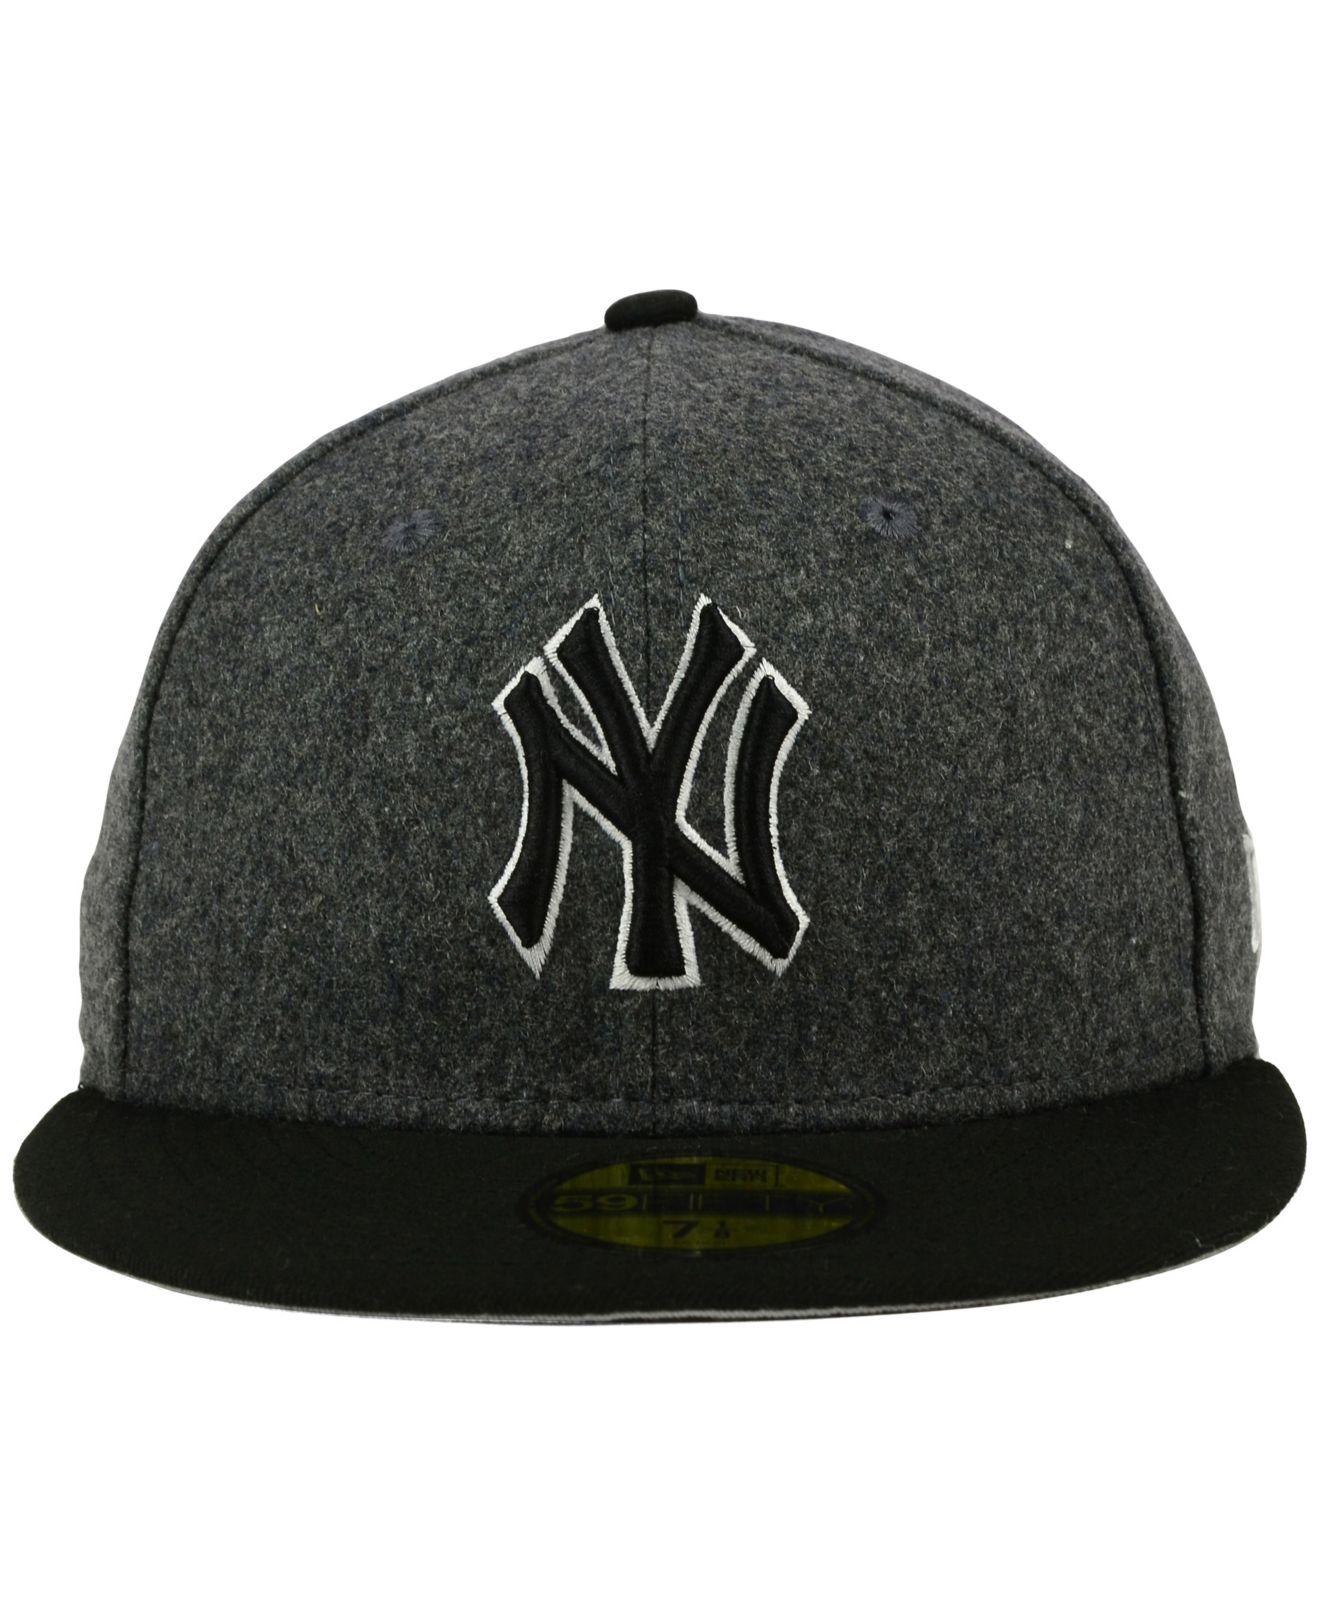 brand new 340b4 2bef3 Lyst - KTZ New York Yankees Shader Melt 59fifty Cap in Gray for Men